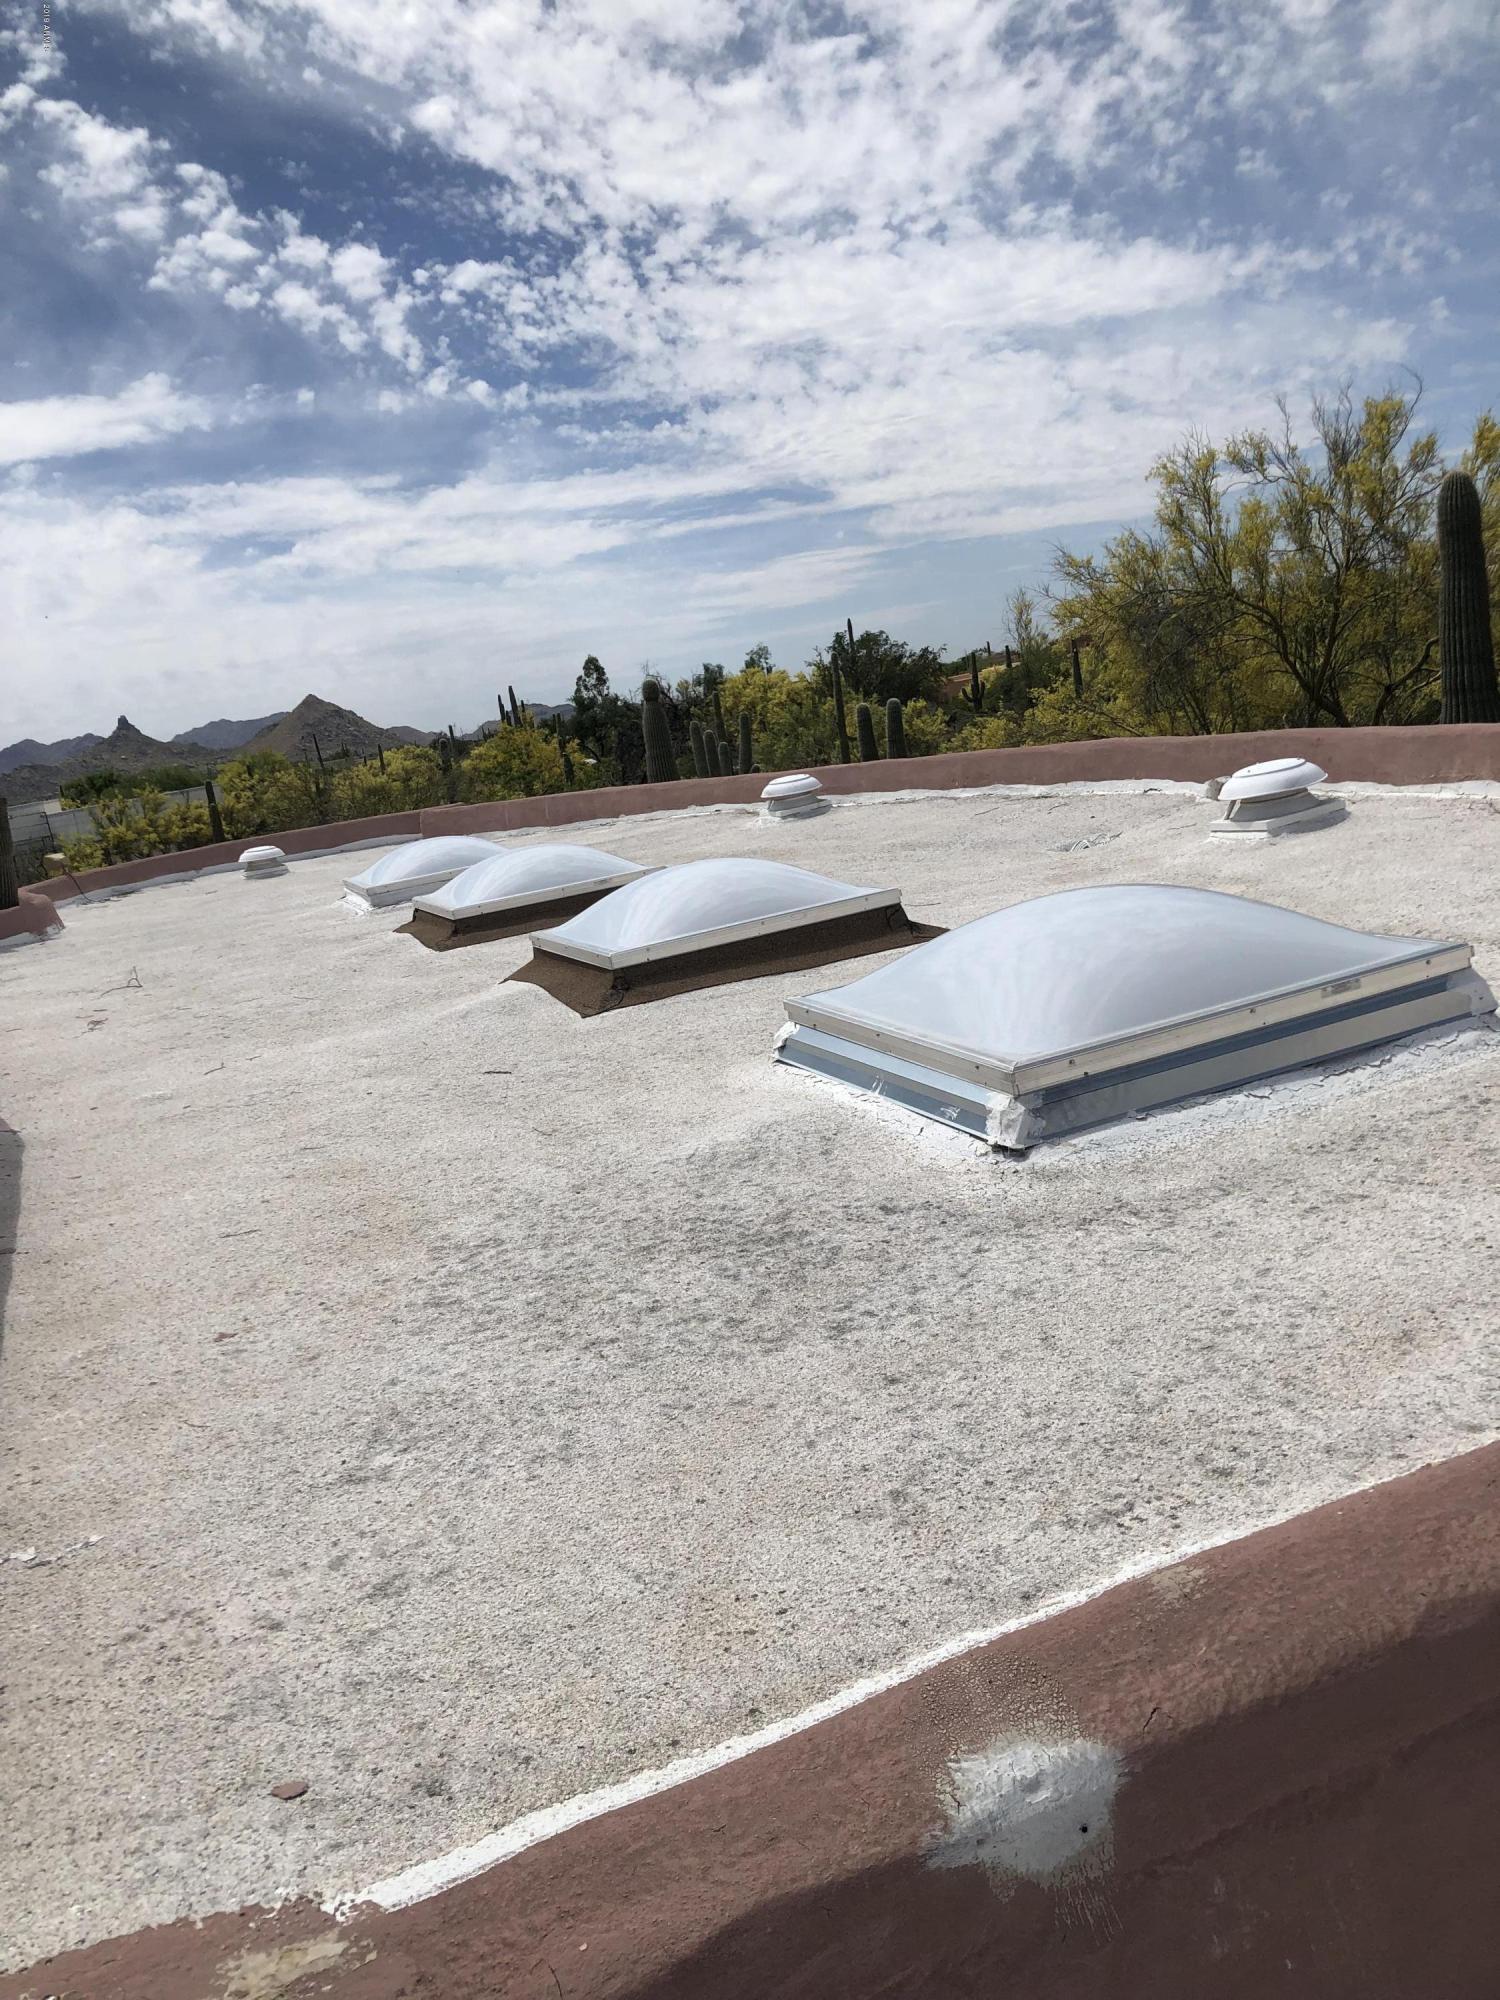 MLS 5934791 30600 N PIMA Road Unit 56A, Scottsdale, AZ 85266 Scottsdale AZ Private Pool